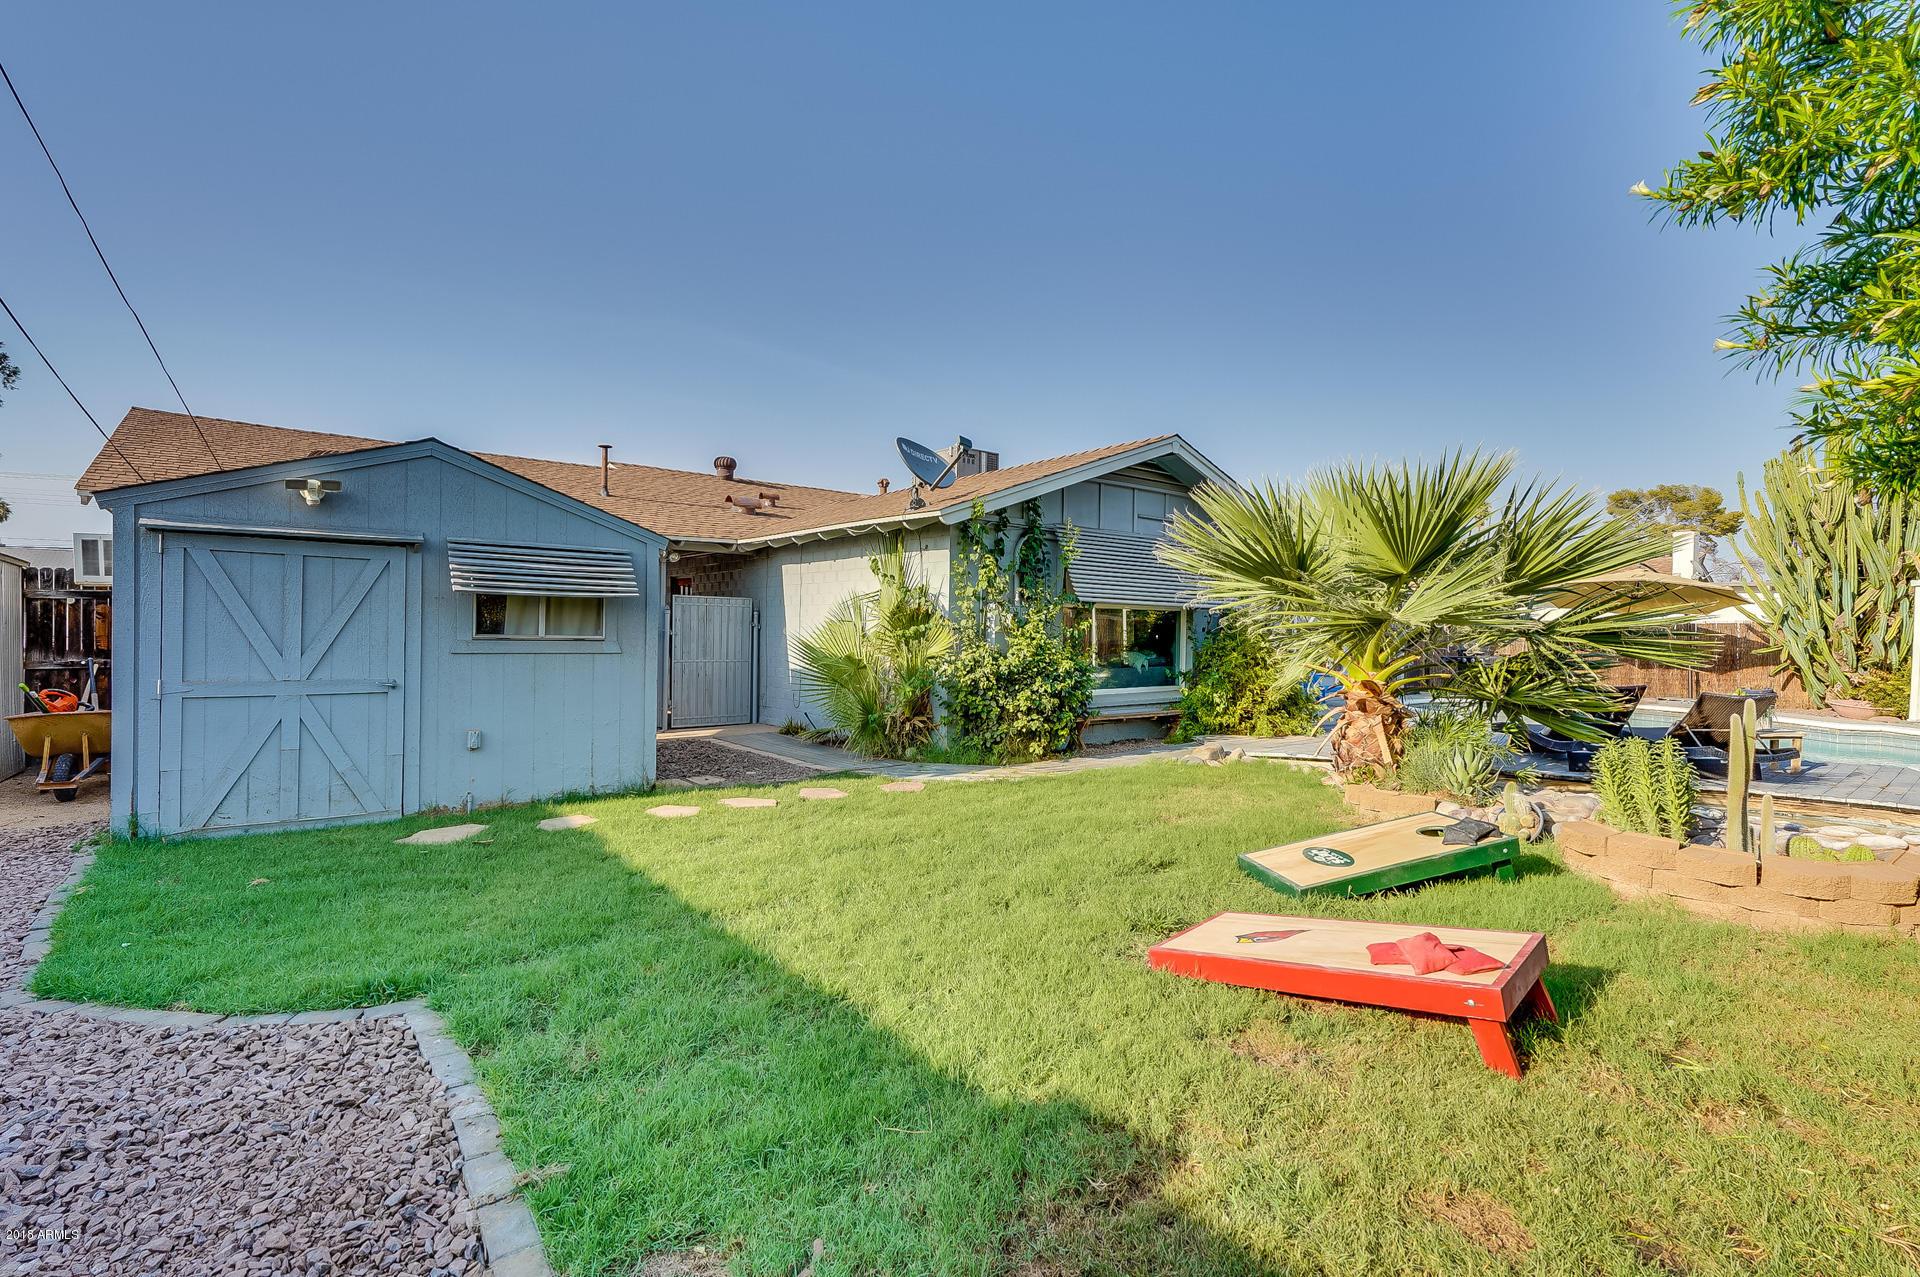 MLS 5805173 8613 E VIRGINIA Avenue, Scottsdale, AZ 85257 Scottsdale AZ Scottsdale Estates